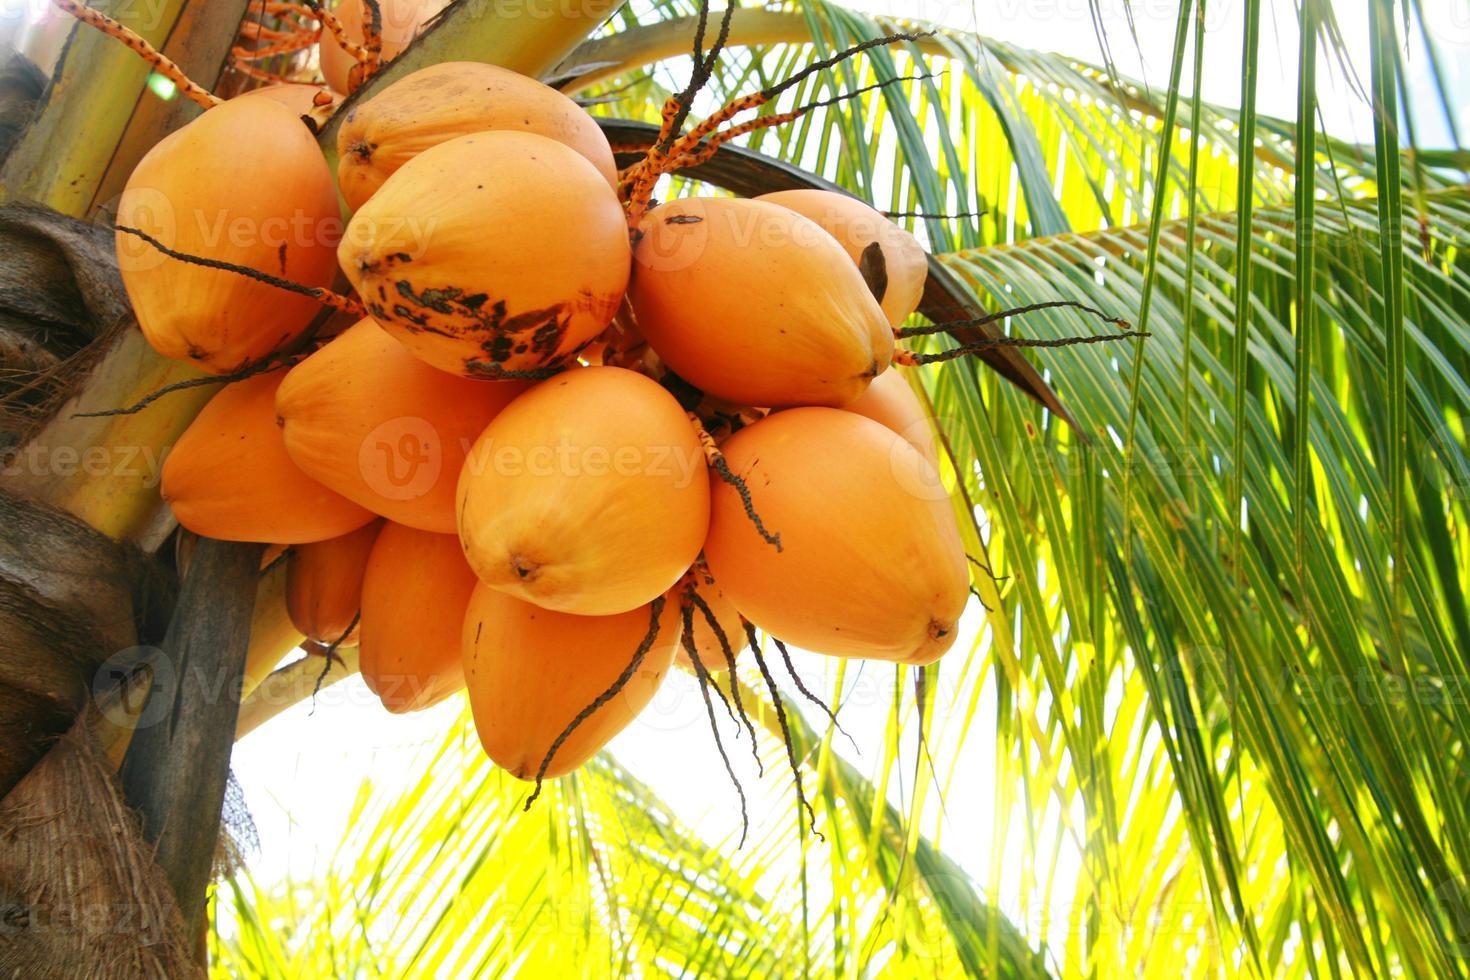 kokosnötter i palmträd foto